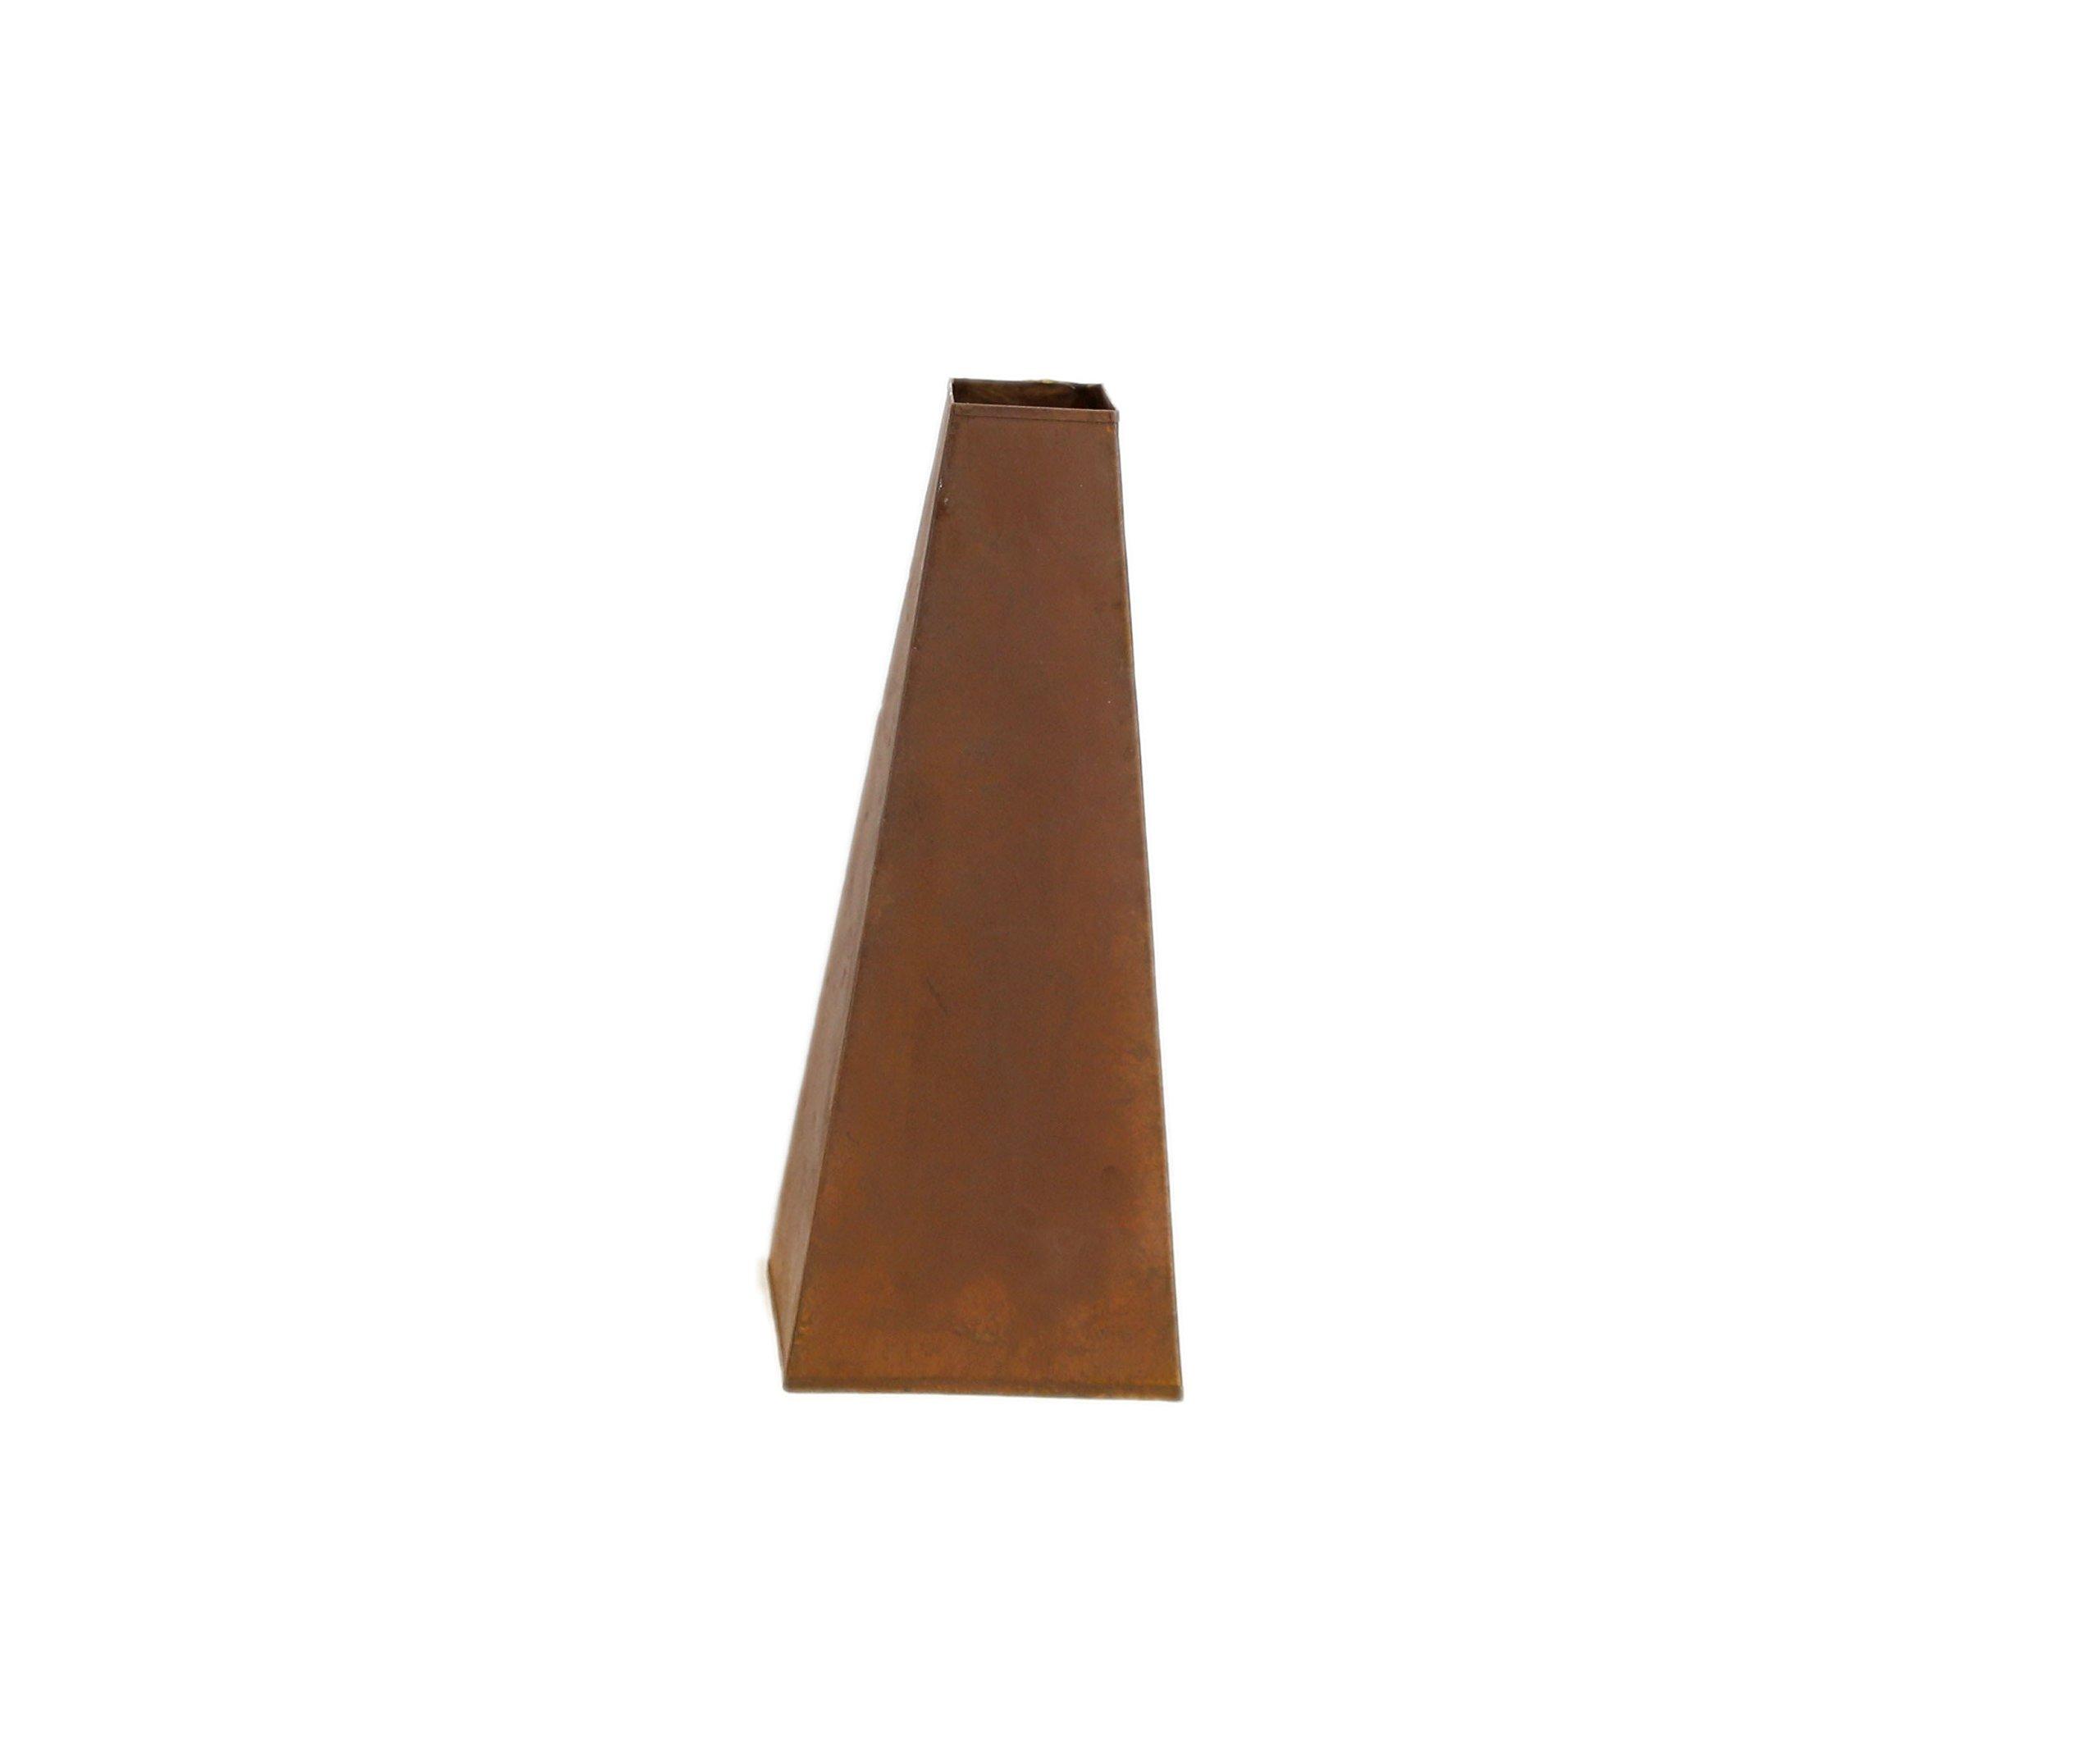 Medium Rusty Tapered Vase